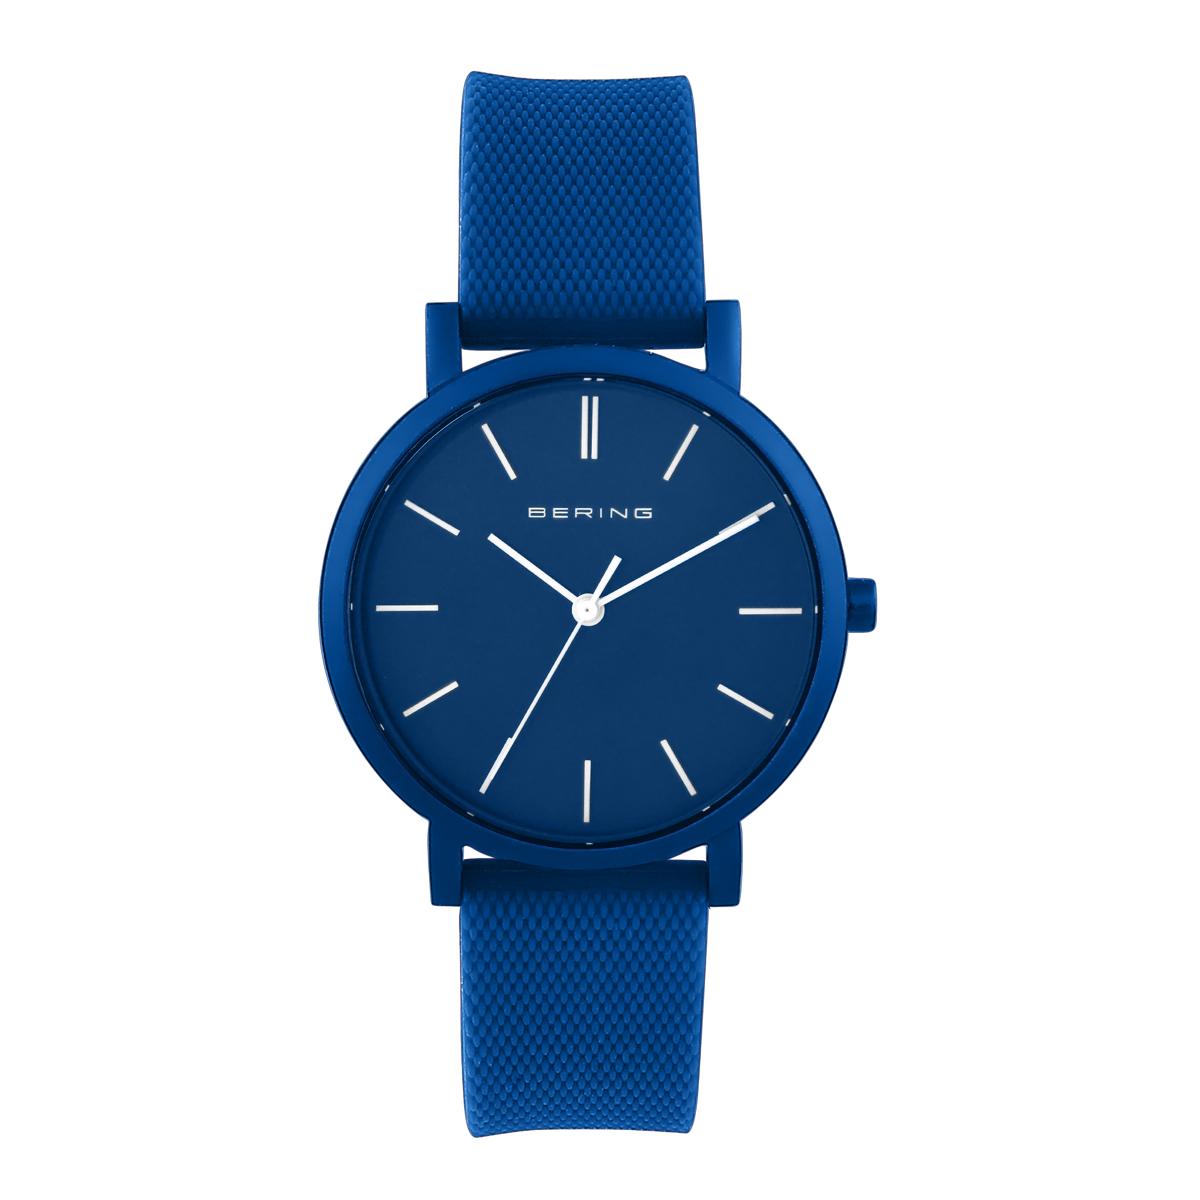 Bering Blue Analogue Women's Watch – 16934-799